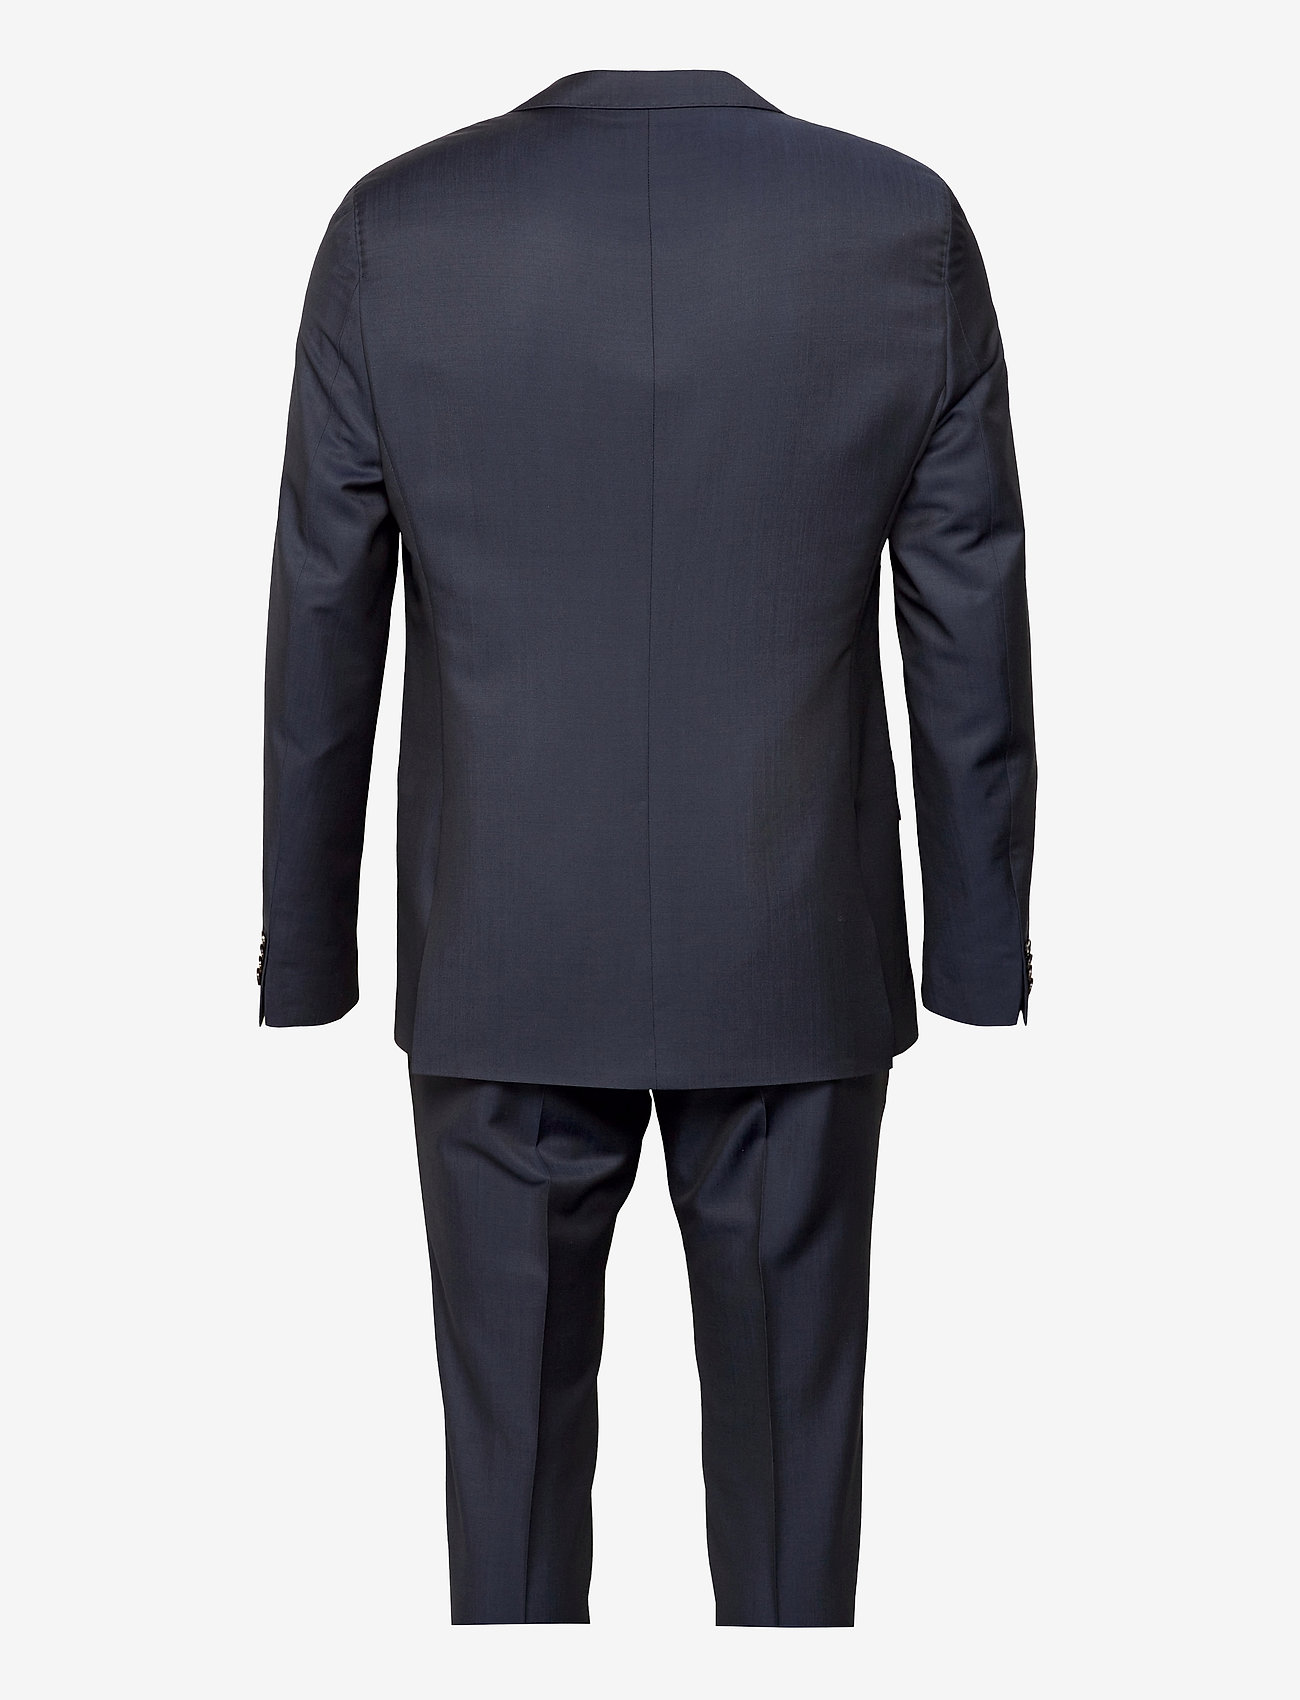 SAND - Prunella Mohair - Star Napoli-Craig - kostuums met enkele rij knopen - medium blue - 1